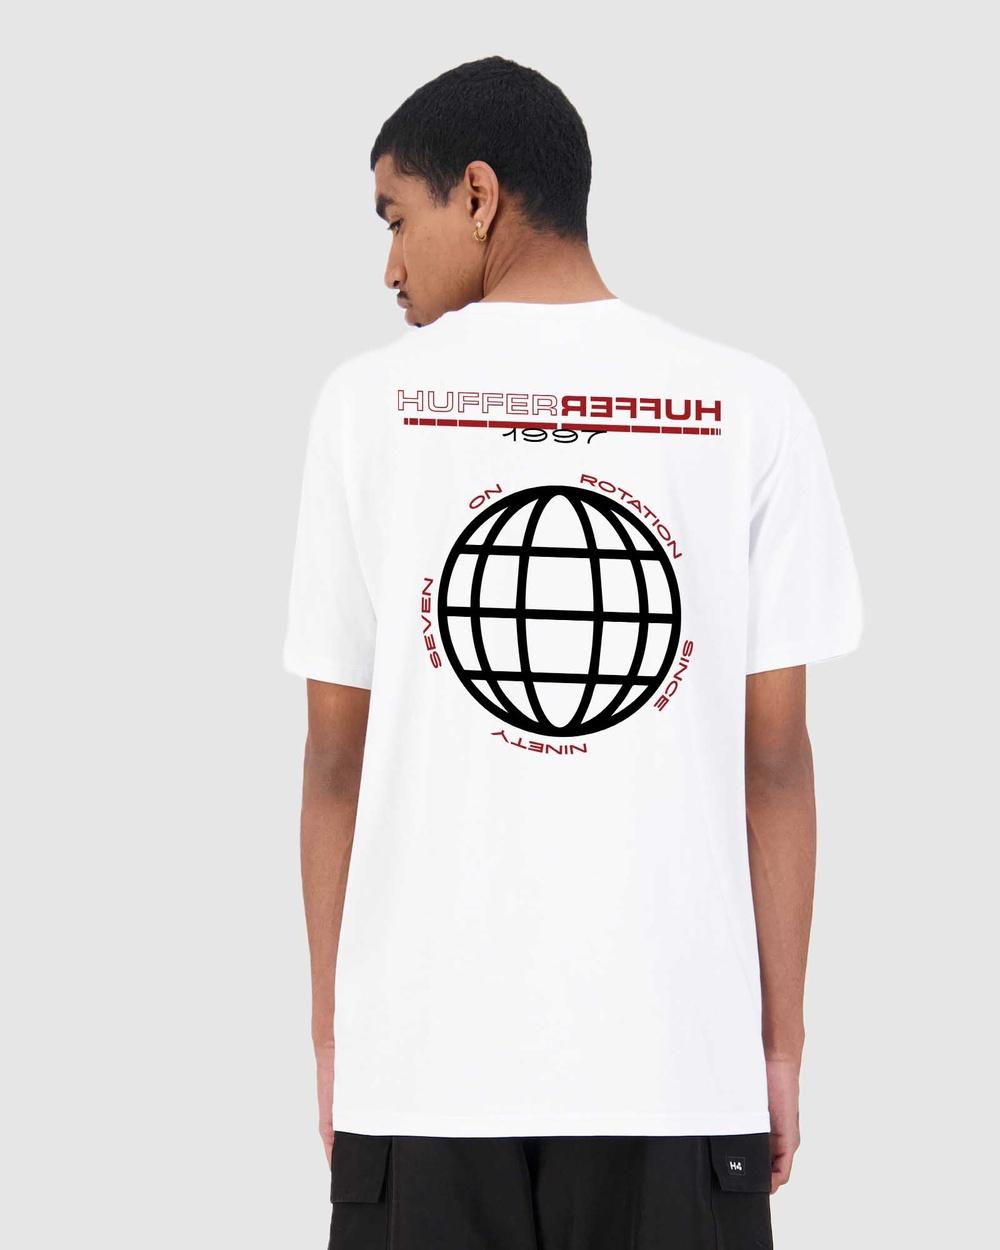 Huffer Men's Sup Tee Repeat T-Shirts & Singlets White Tee-Repeat Australia